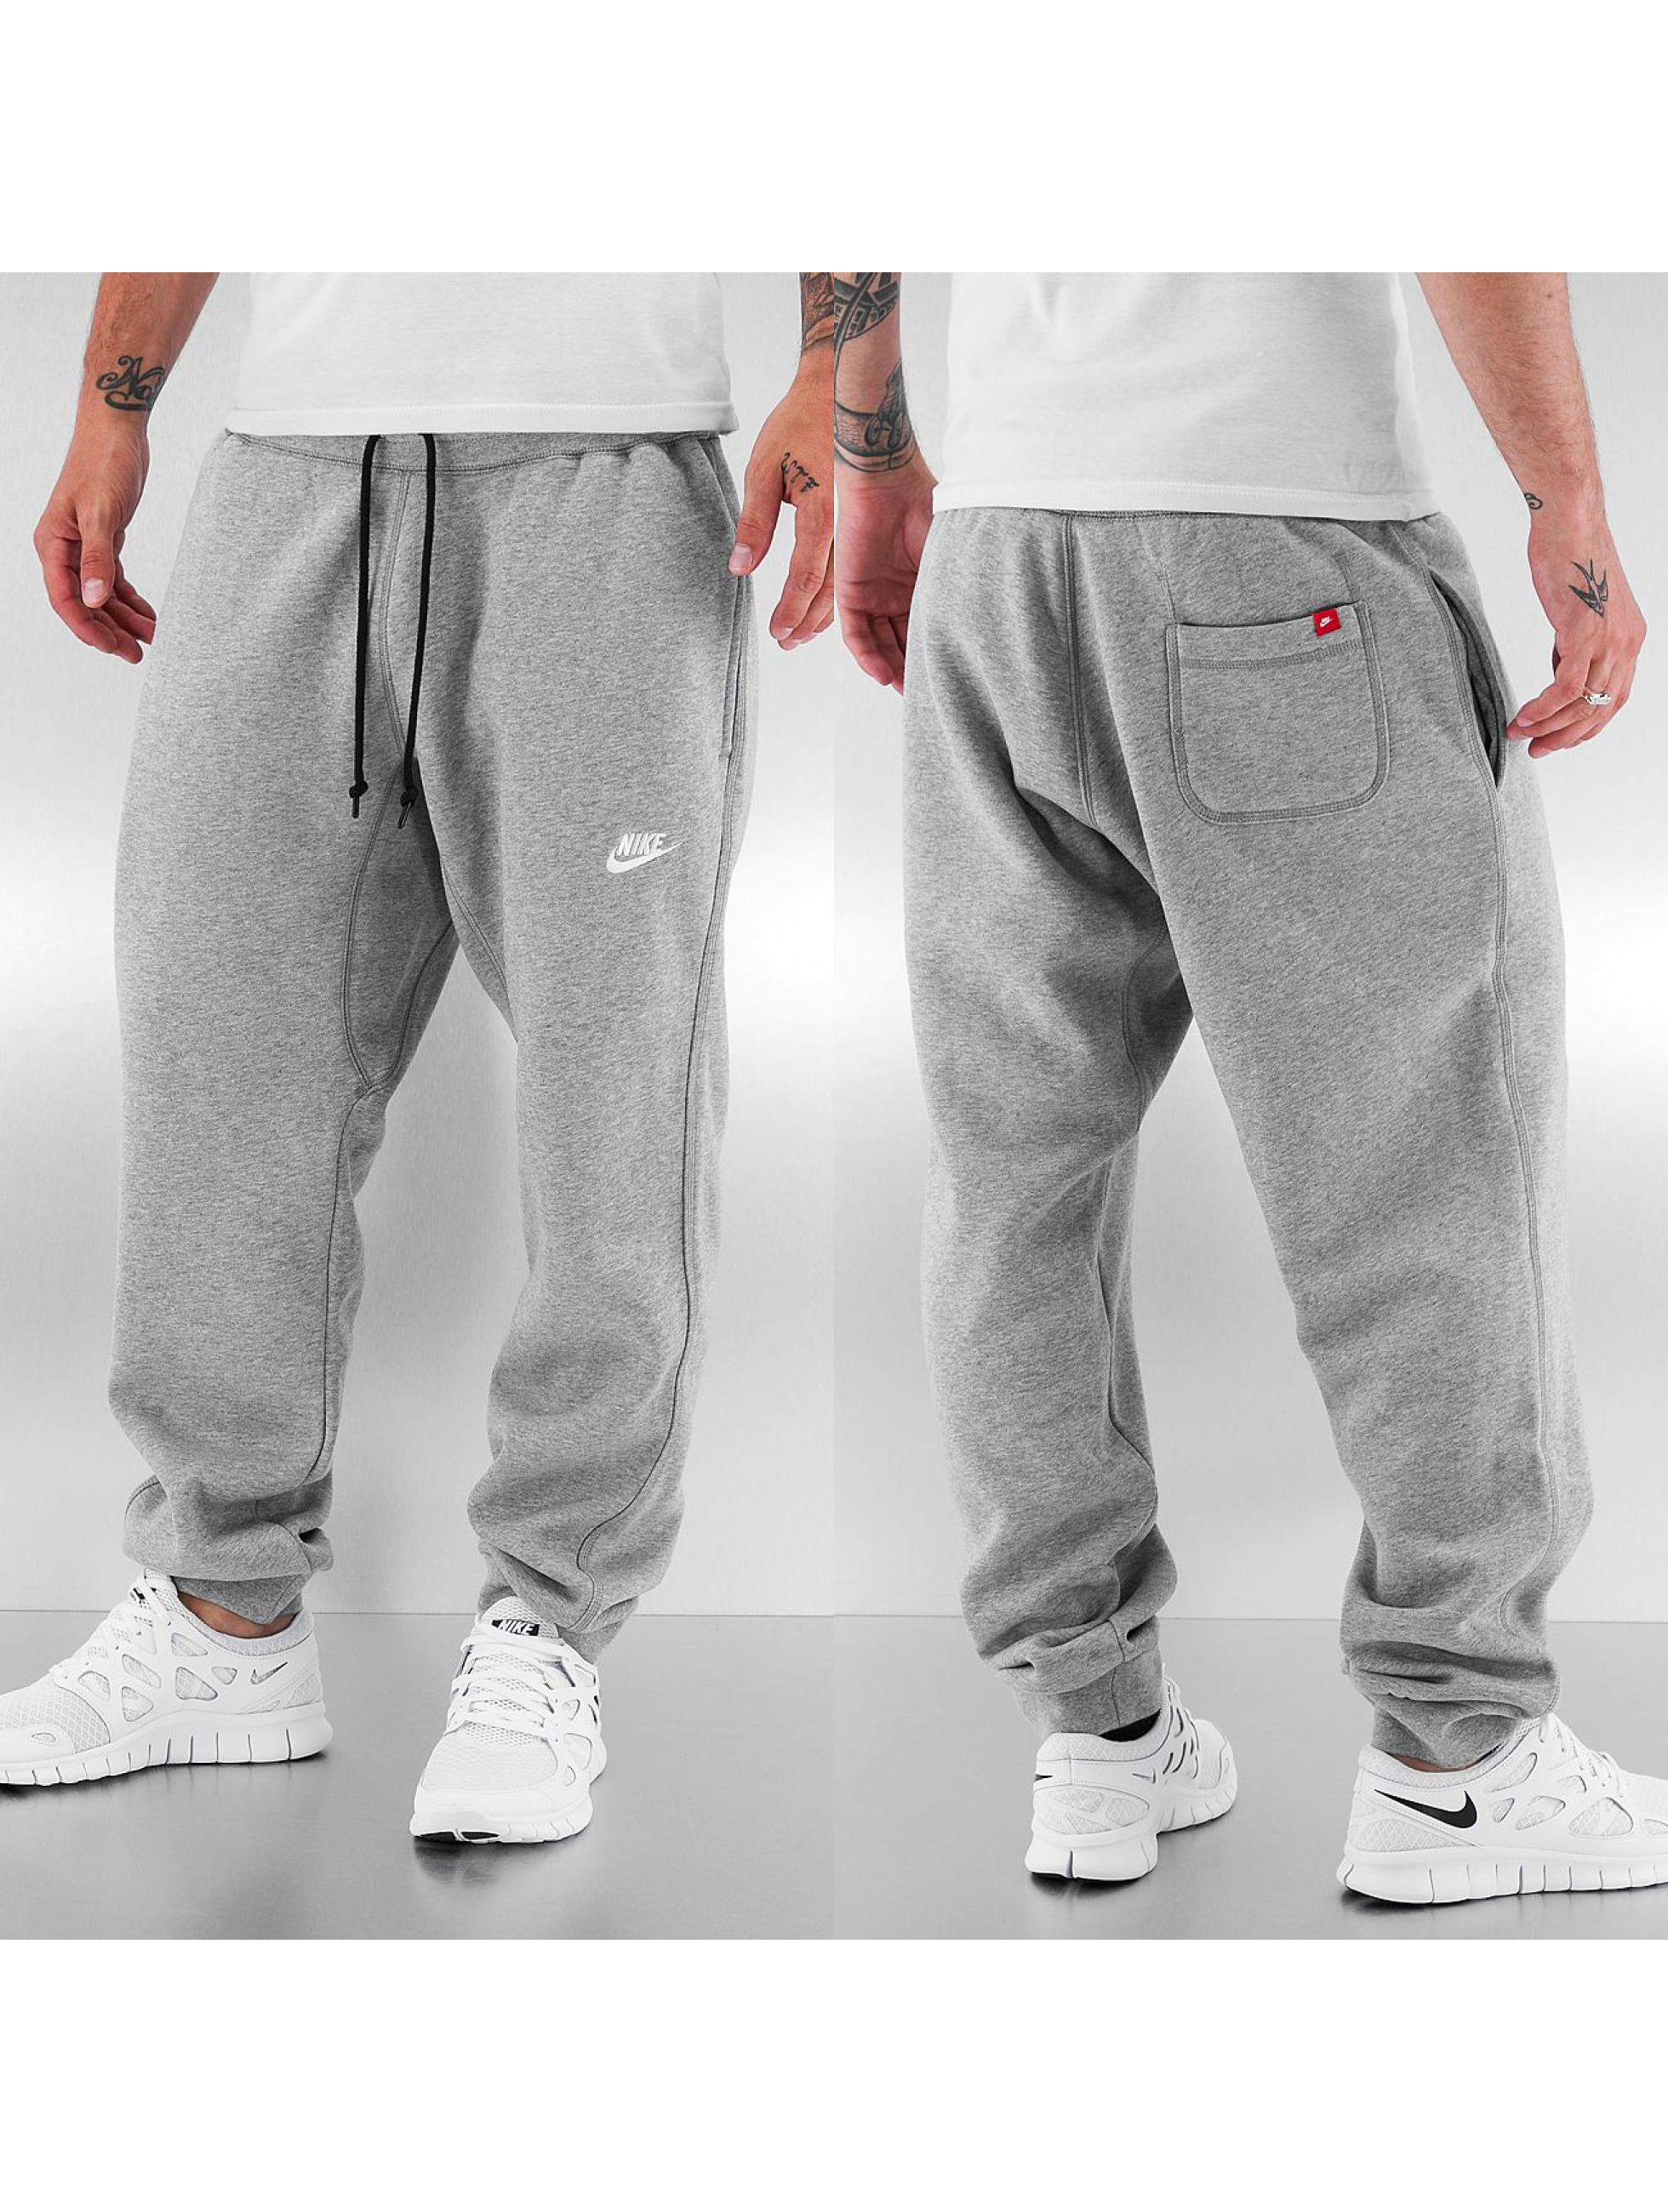 Pantalon Sudaderas Jordan